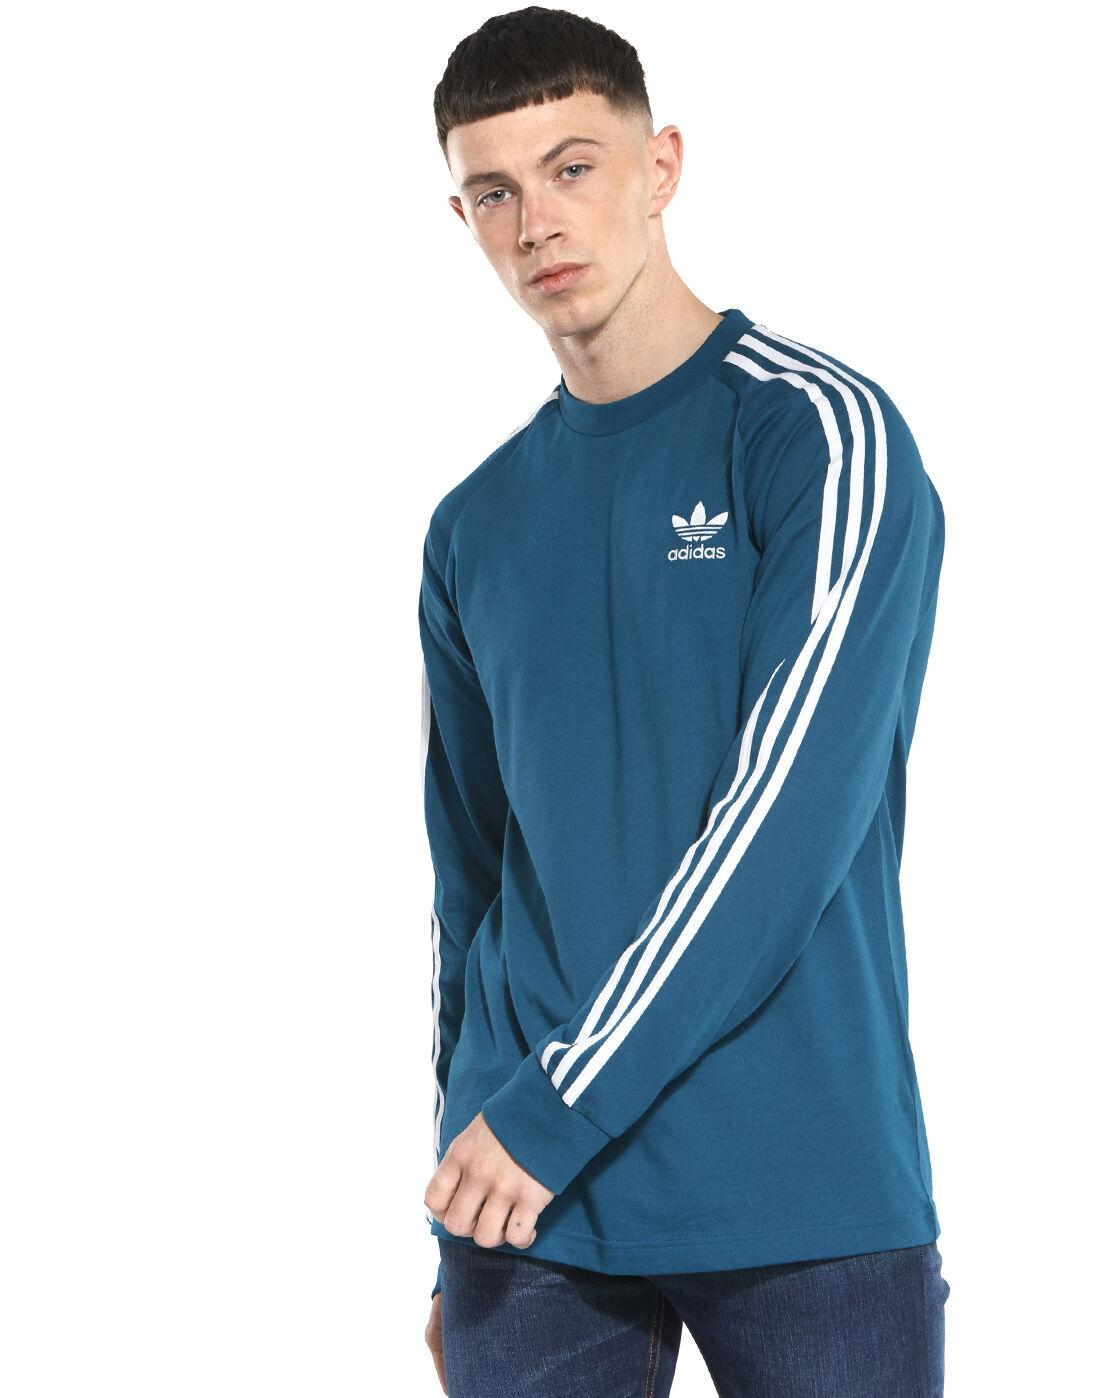 Men's Navy Long Sleeve adidas Originals T-Shirt   Life Style Sports